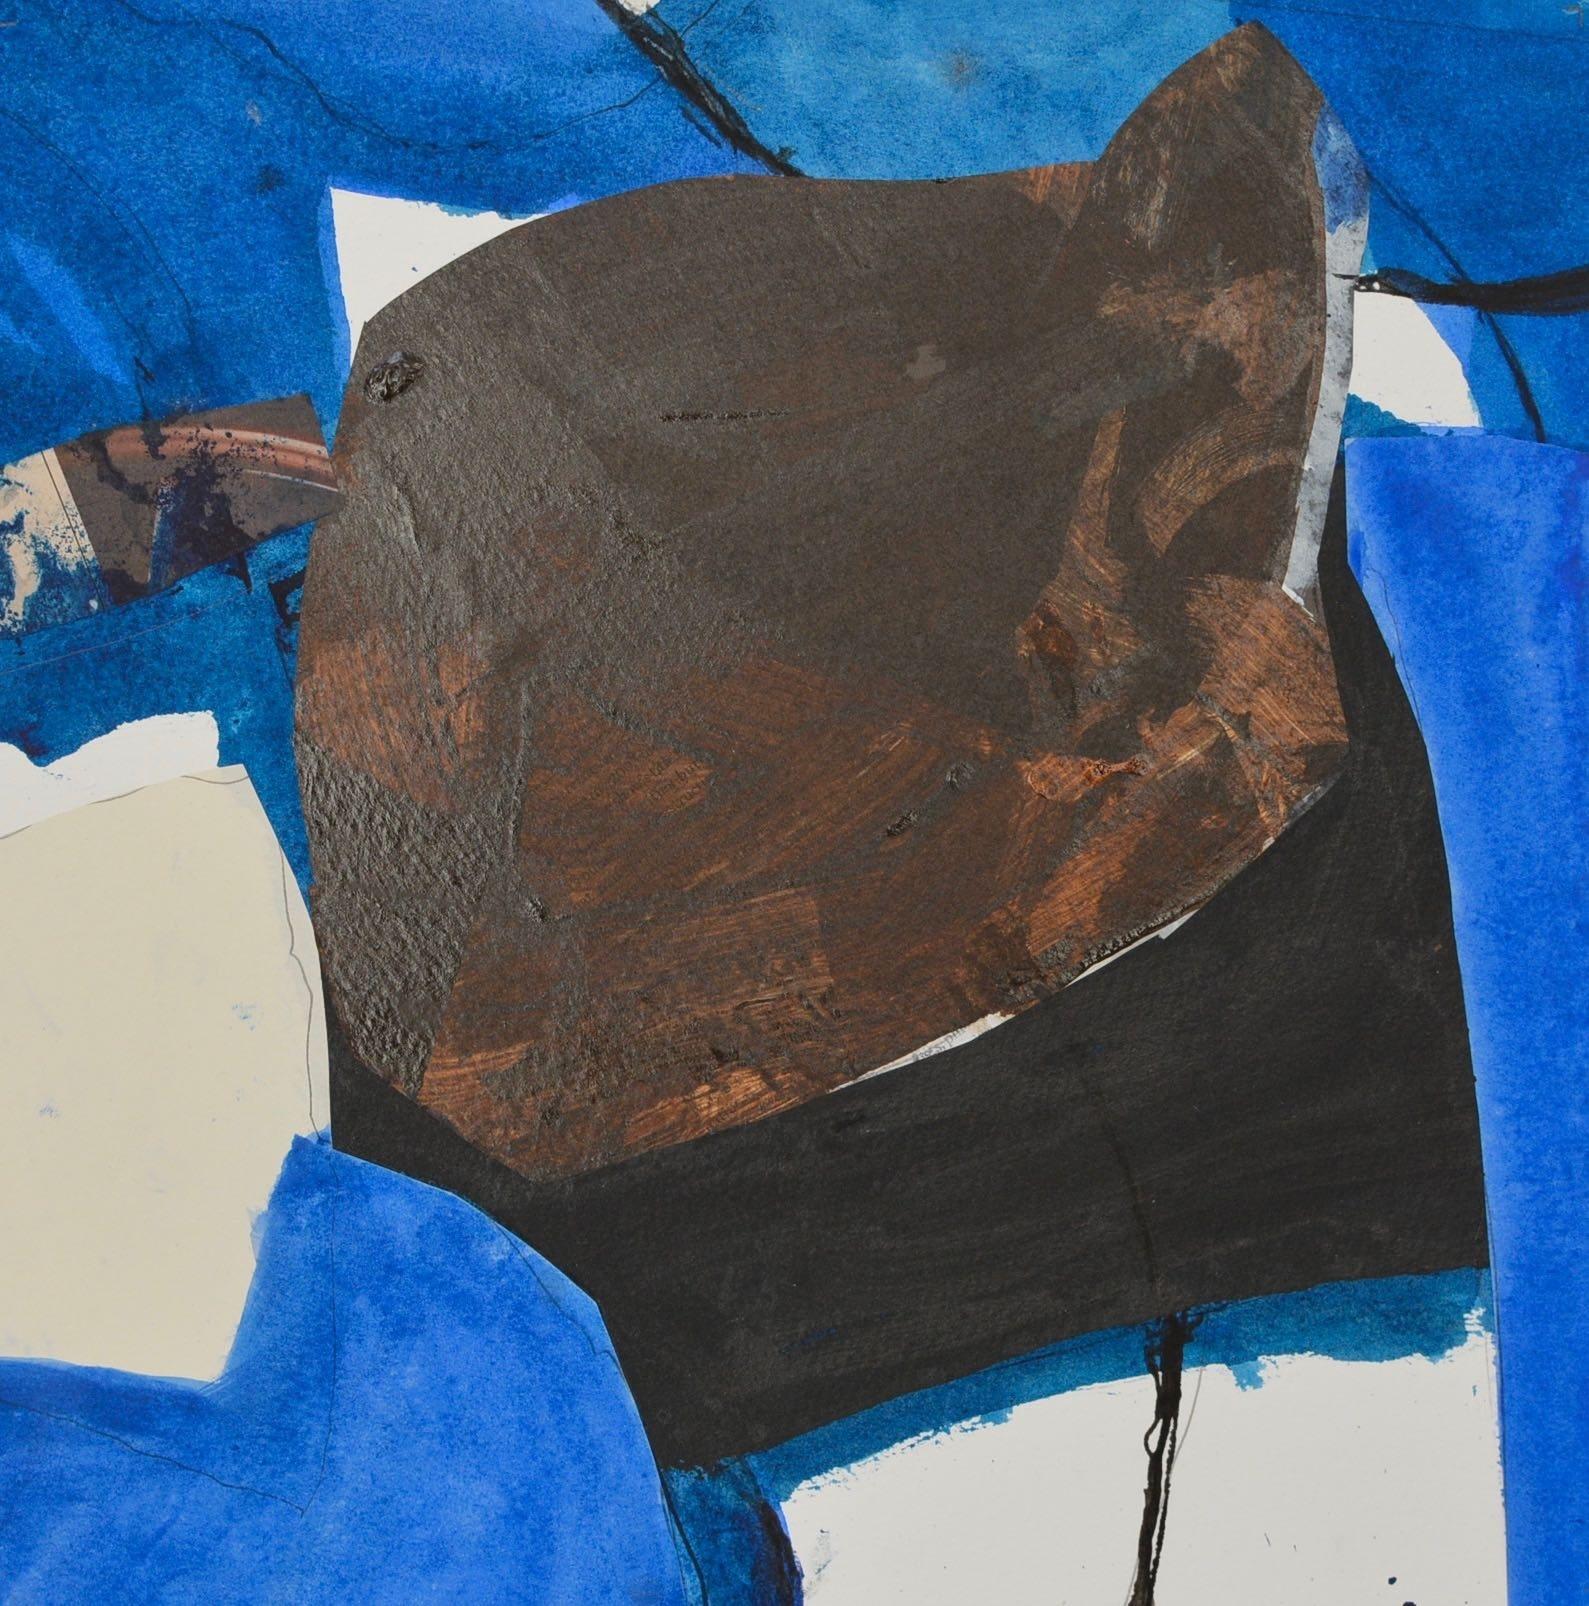 <span class=&#34;link fancybox-details-link&#34;><a href=&#34;/exhibitions/24/works/artworks_standalone10718/&#34;>View Detail Page</a></span><div class=&#34;artist&#34;><span class=&#34;artist&#34;><strong>Jim Hunter</strong></span></div><div class=&#34;title&#34;><em>St Aldhelm</em></div><div class=&#34;medium&#34;>watercolour, acrylic, ink & pasted paper</div><div class=&#34;dimensions&#34;>49 x 49cm</div>